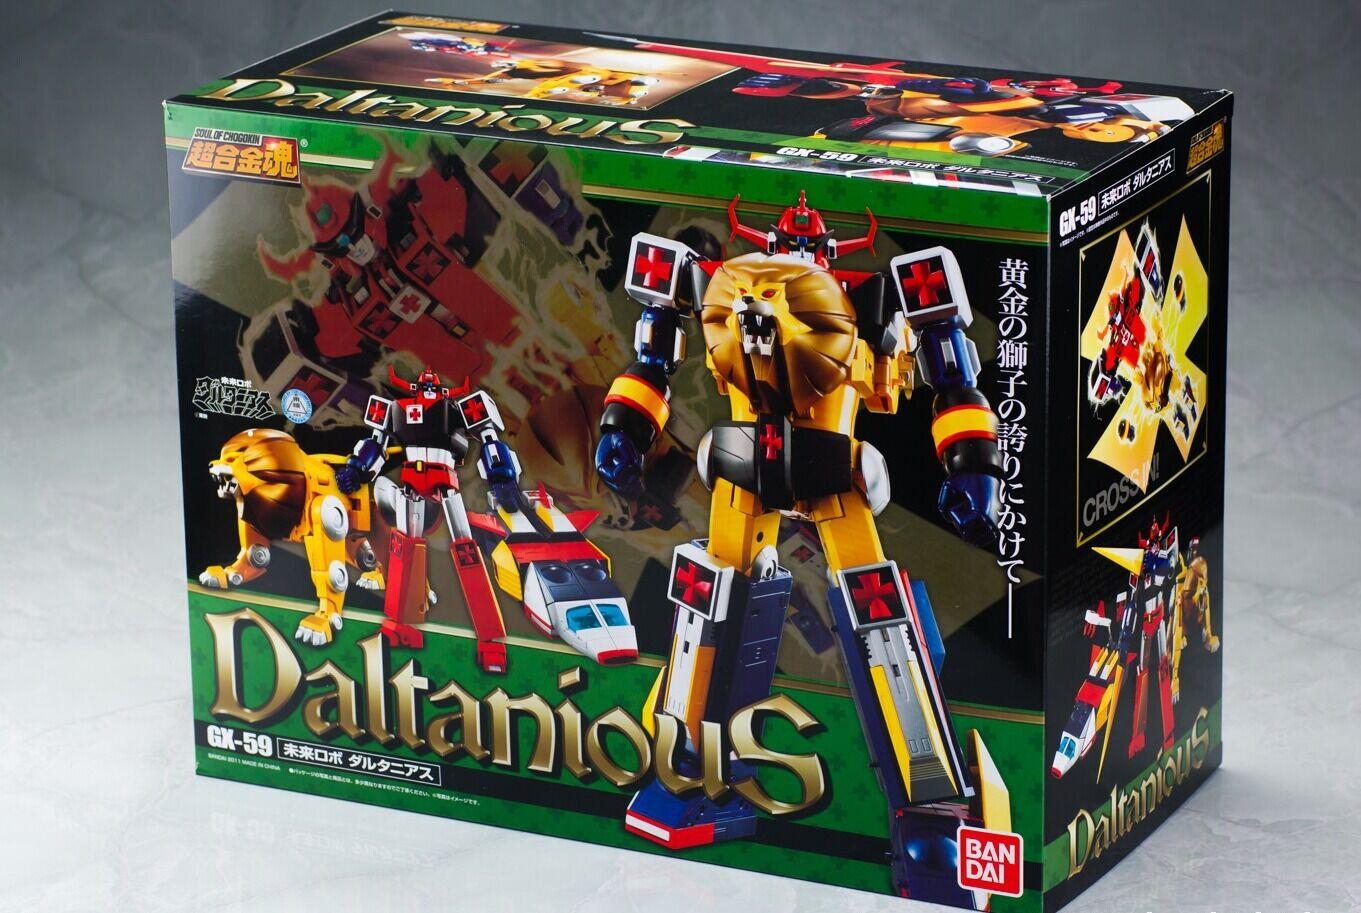 Bandai Chogokin Tamashii futuro robot Daltanias Figura de Acción Japón Import F S